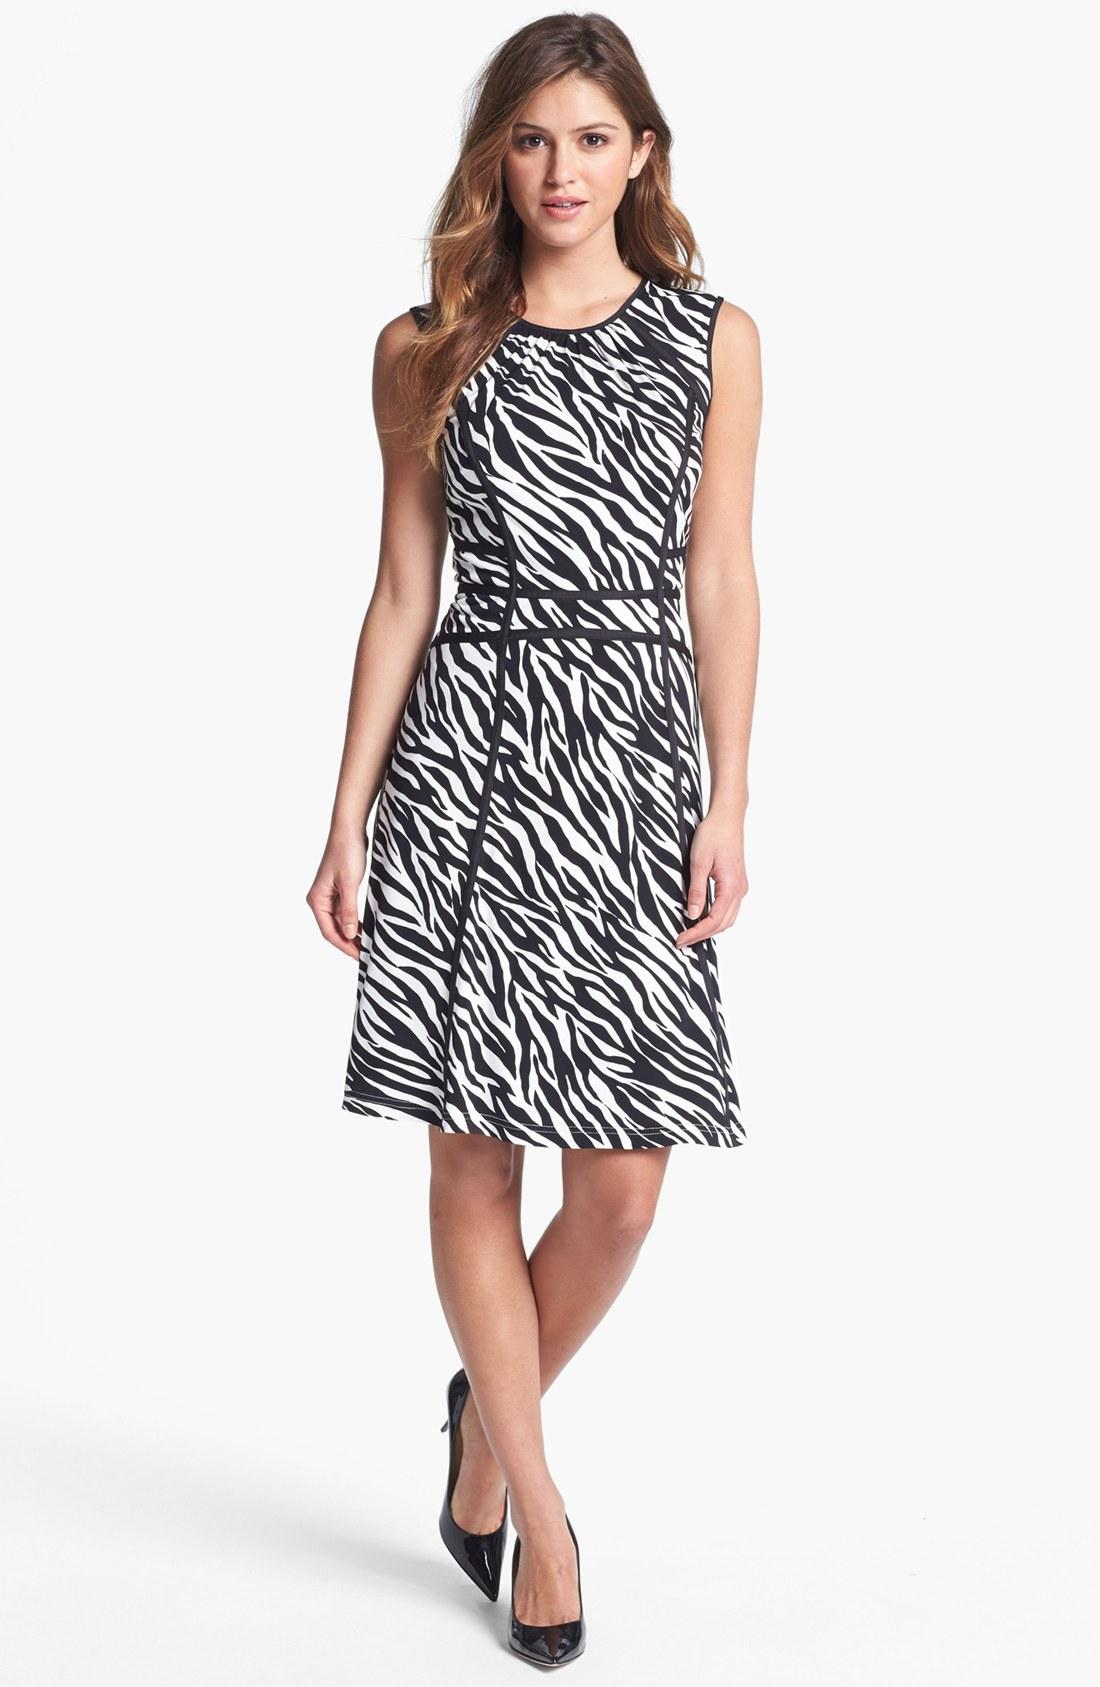 6b93fd4f75 White leopard print dress - photo 18